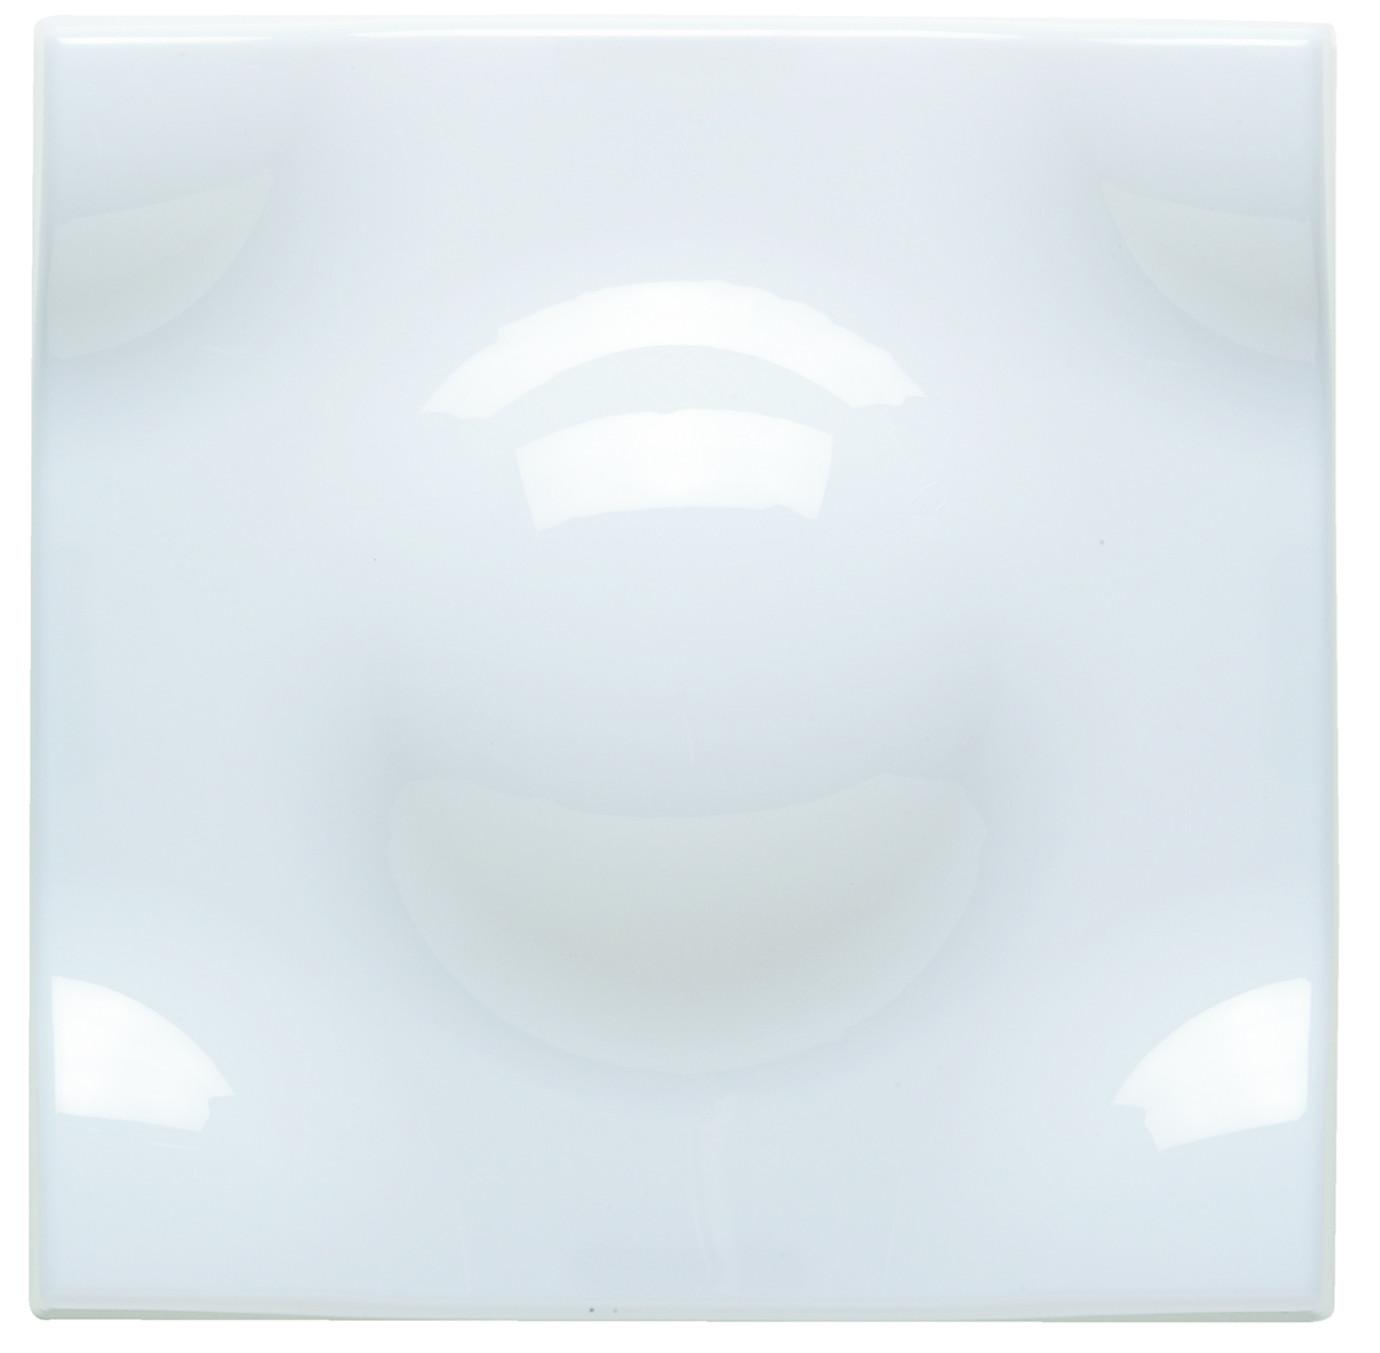 0-Control-Sonido-Paneles-Acusticos-Soundwave-Swell-Diffuser-1380